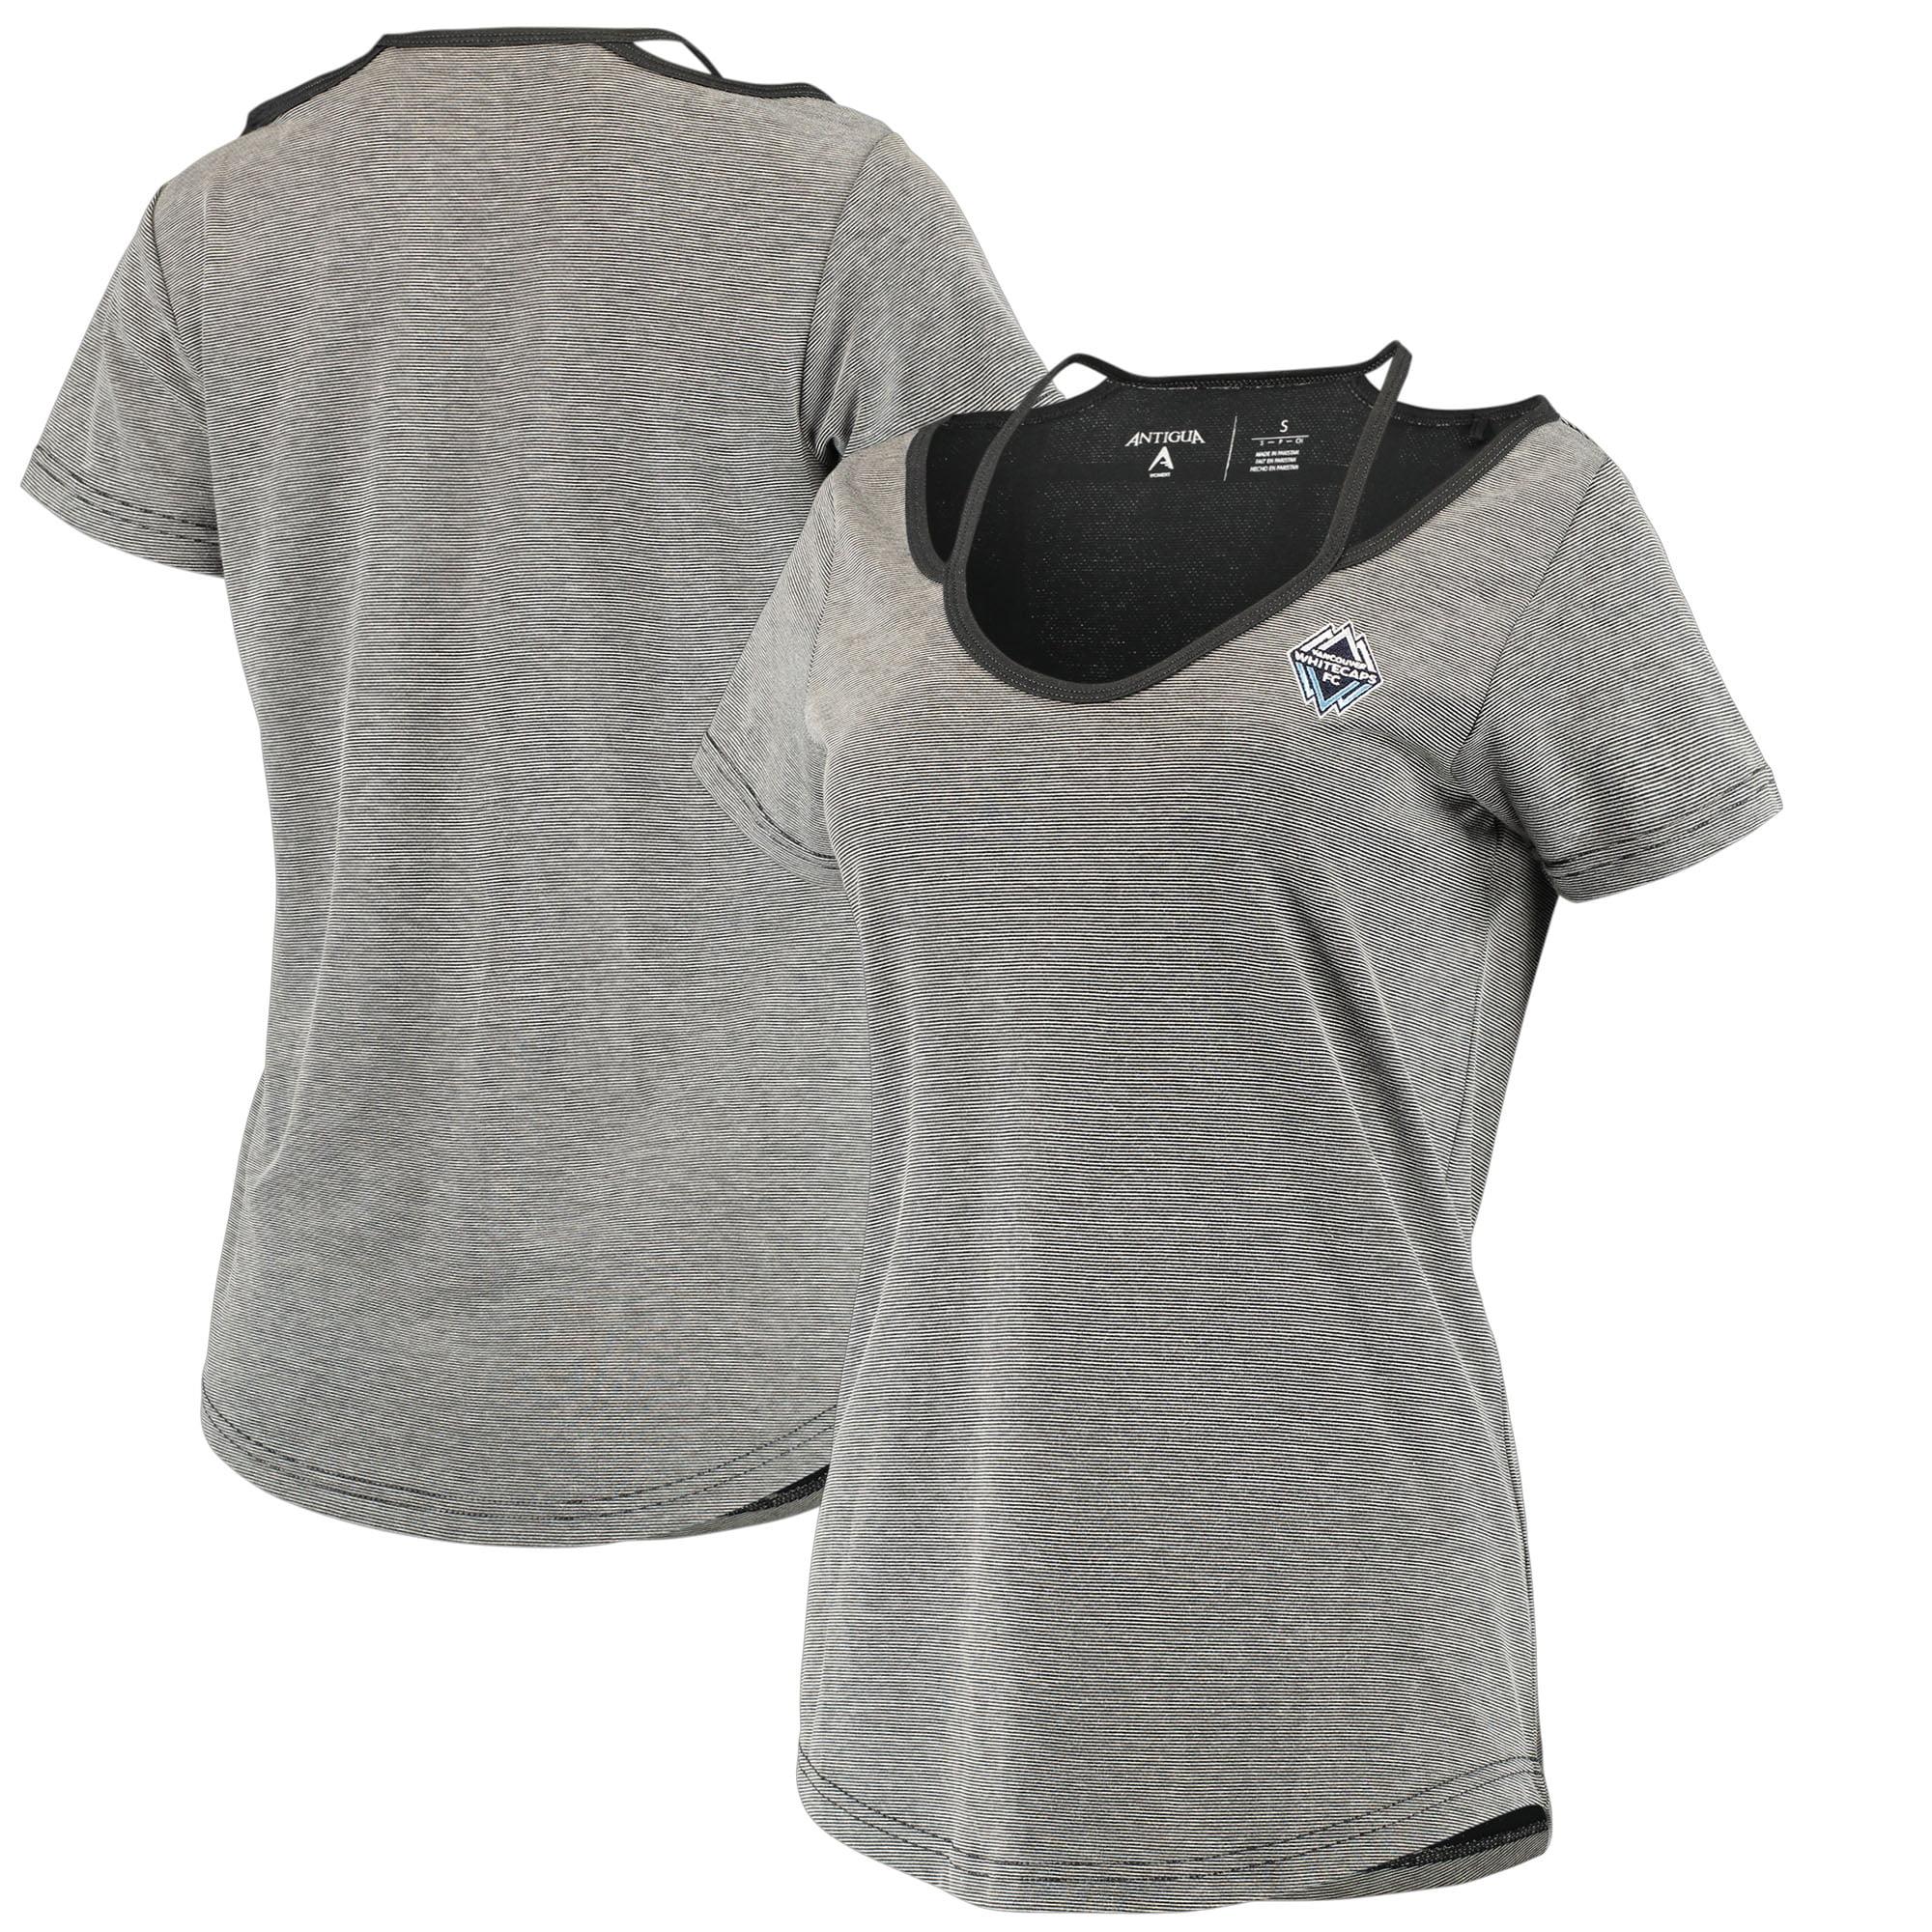 Vancouver Whitecaps FC Antigua Women's Hitter Cut Out T-Shirt - Black/Gray